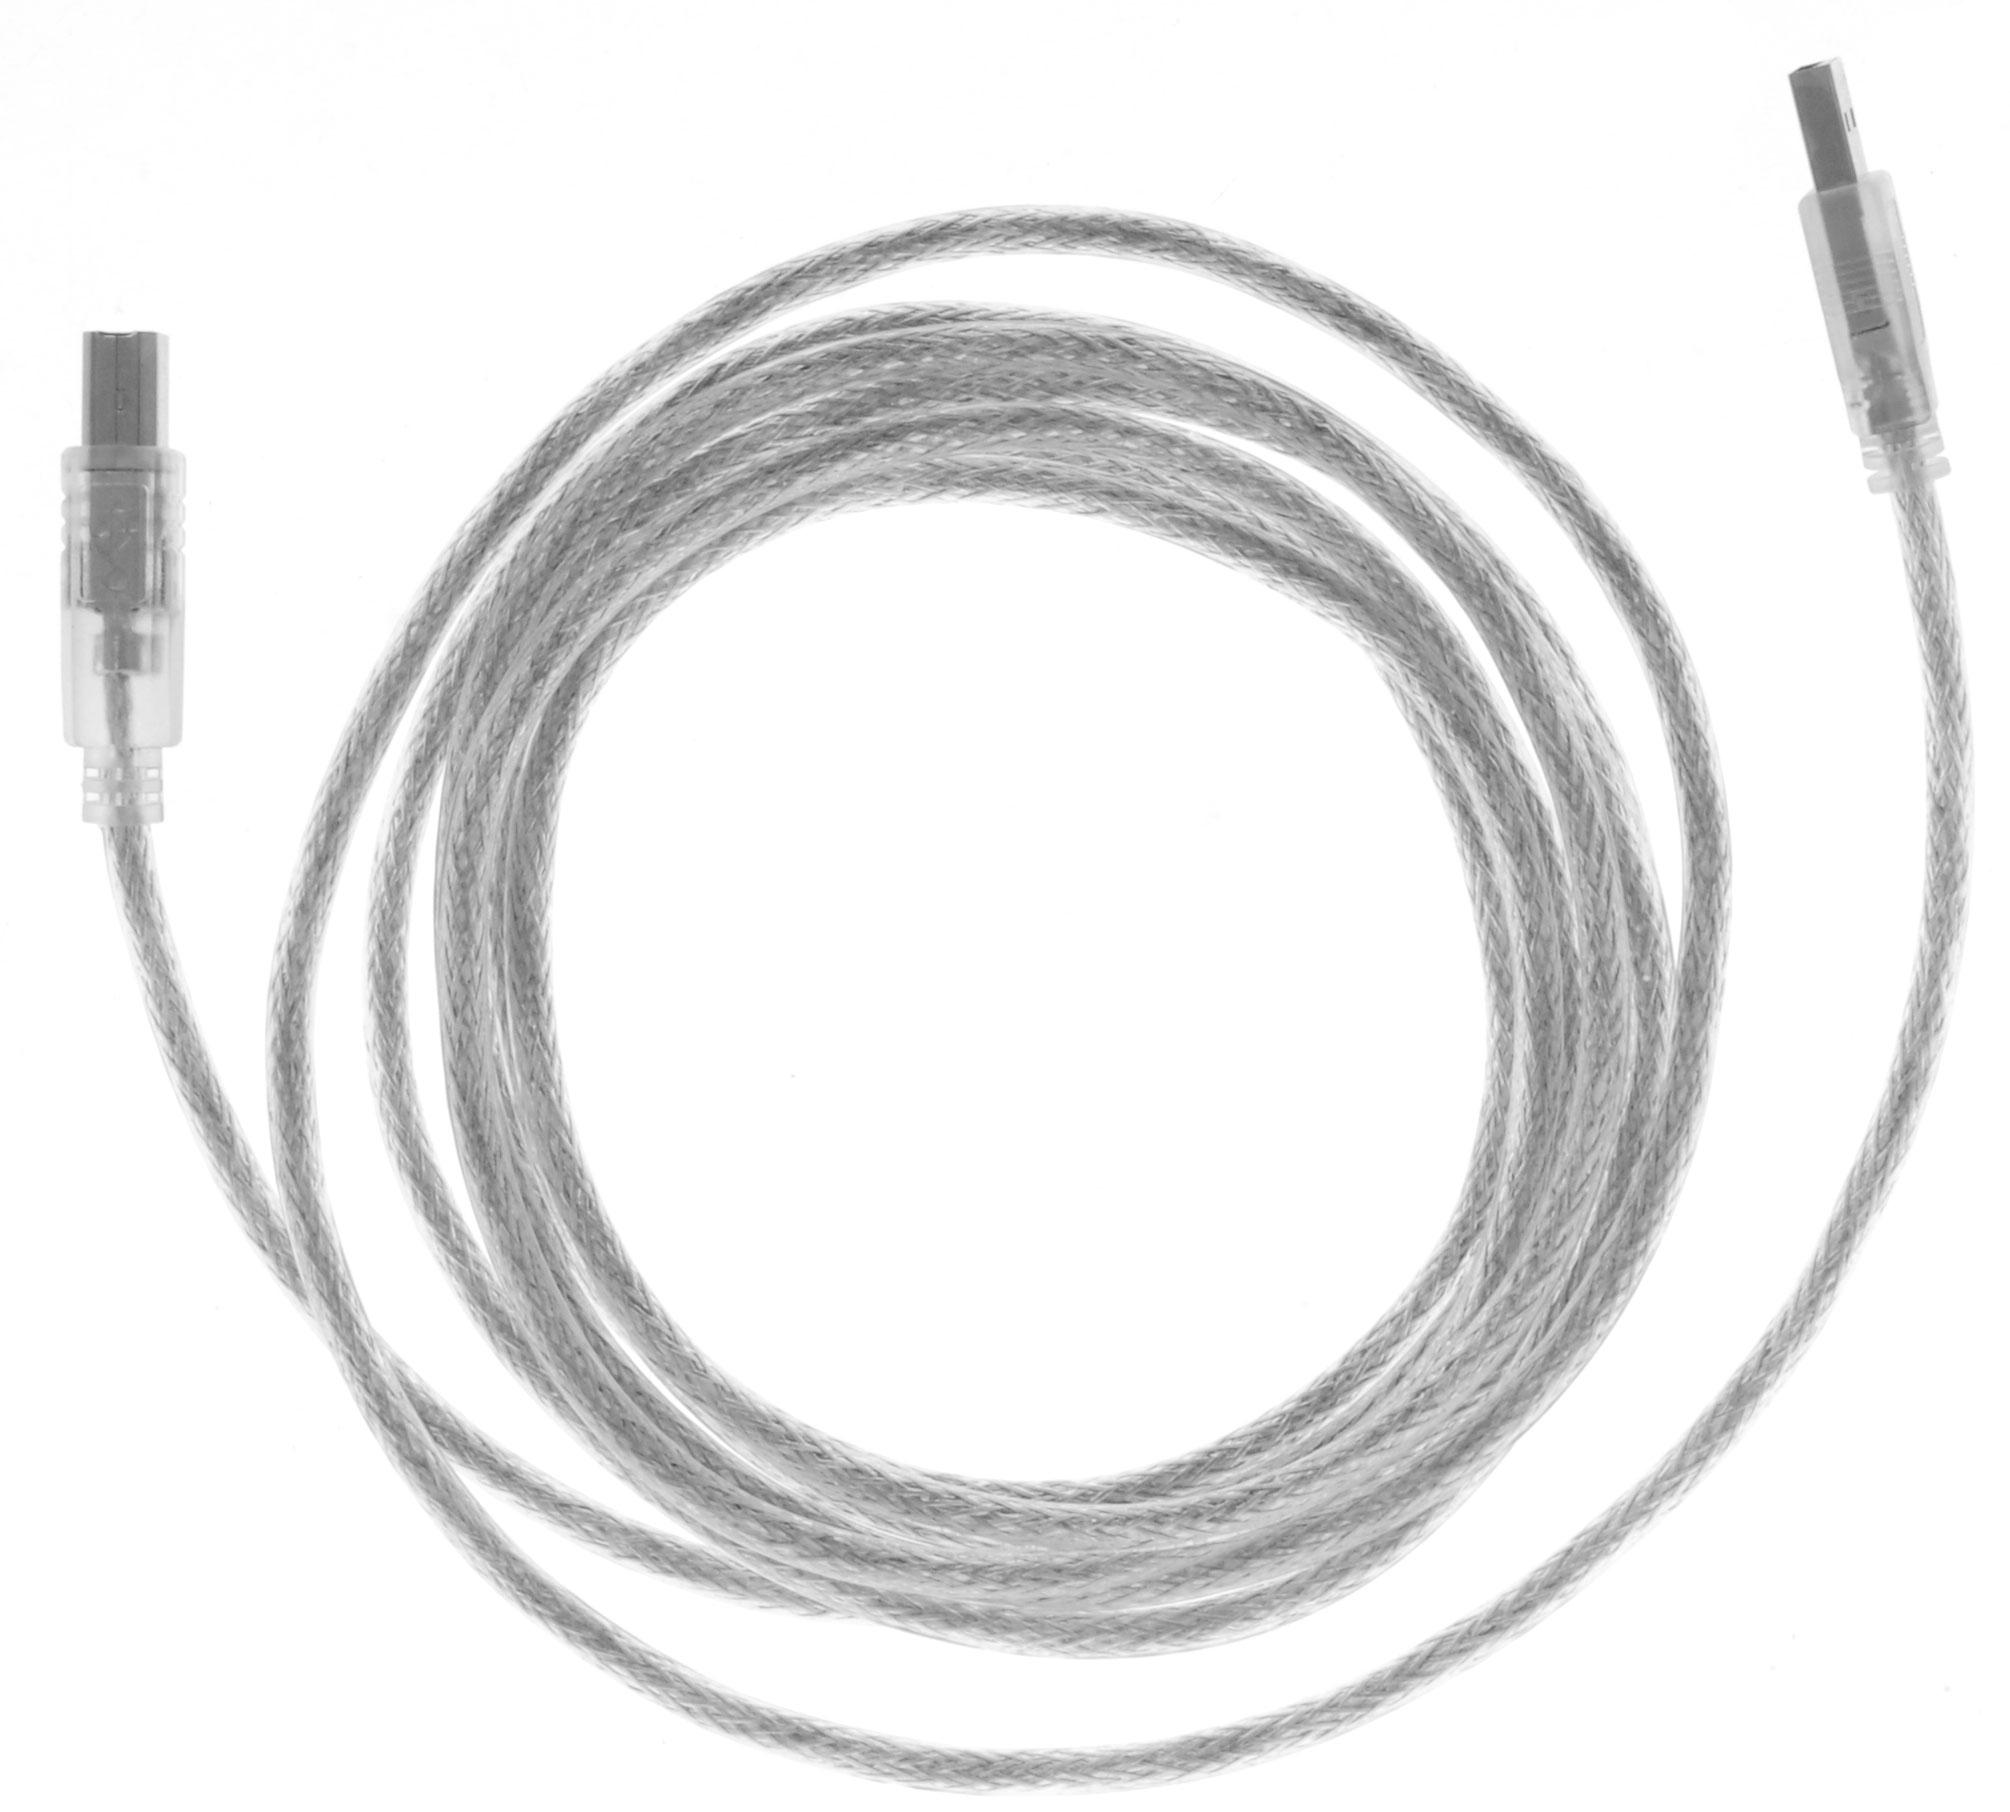 Greenconnect Premium GCR-UPC2M-BD2S, Clear кабель USB 3.0 м